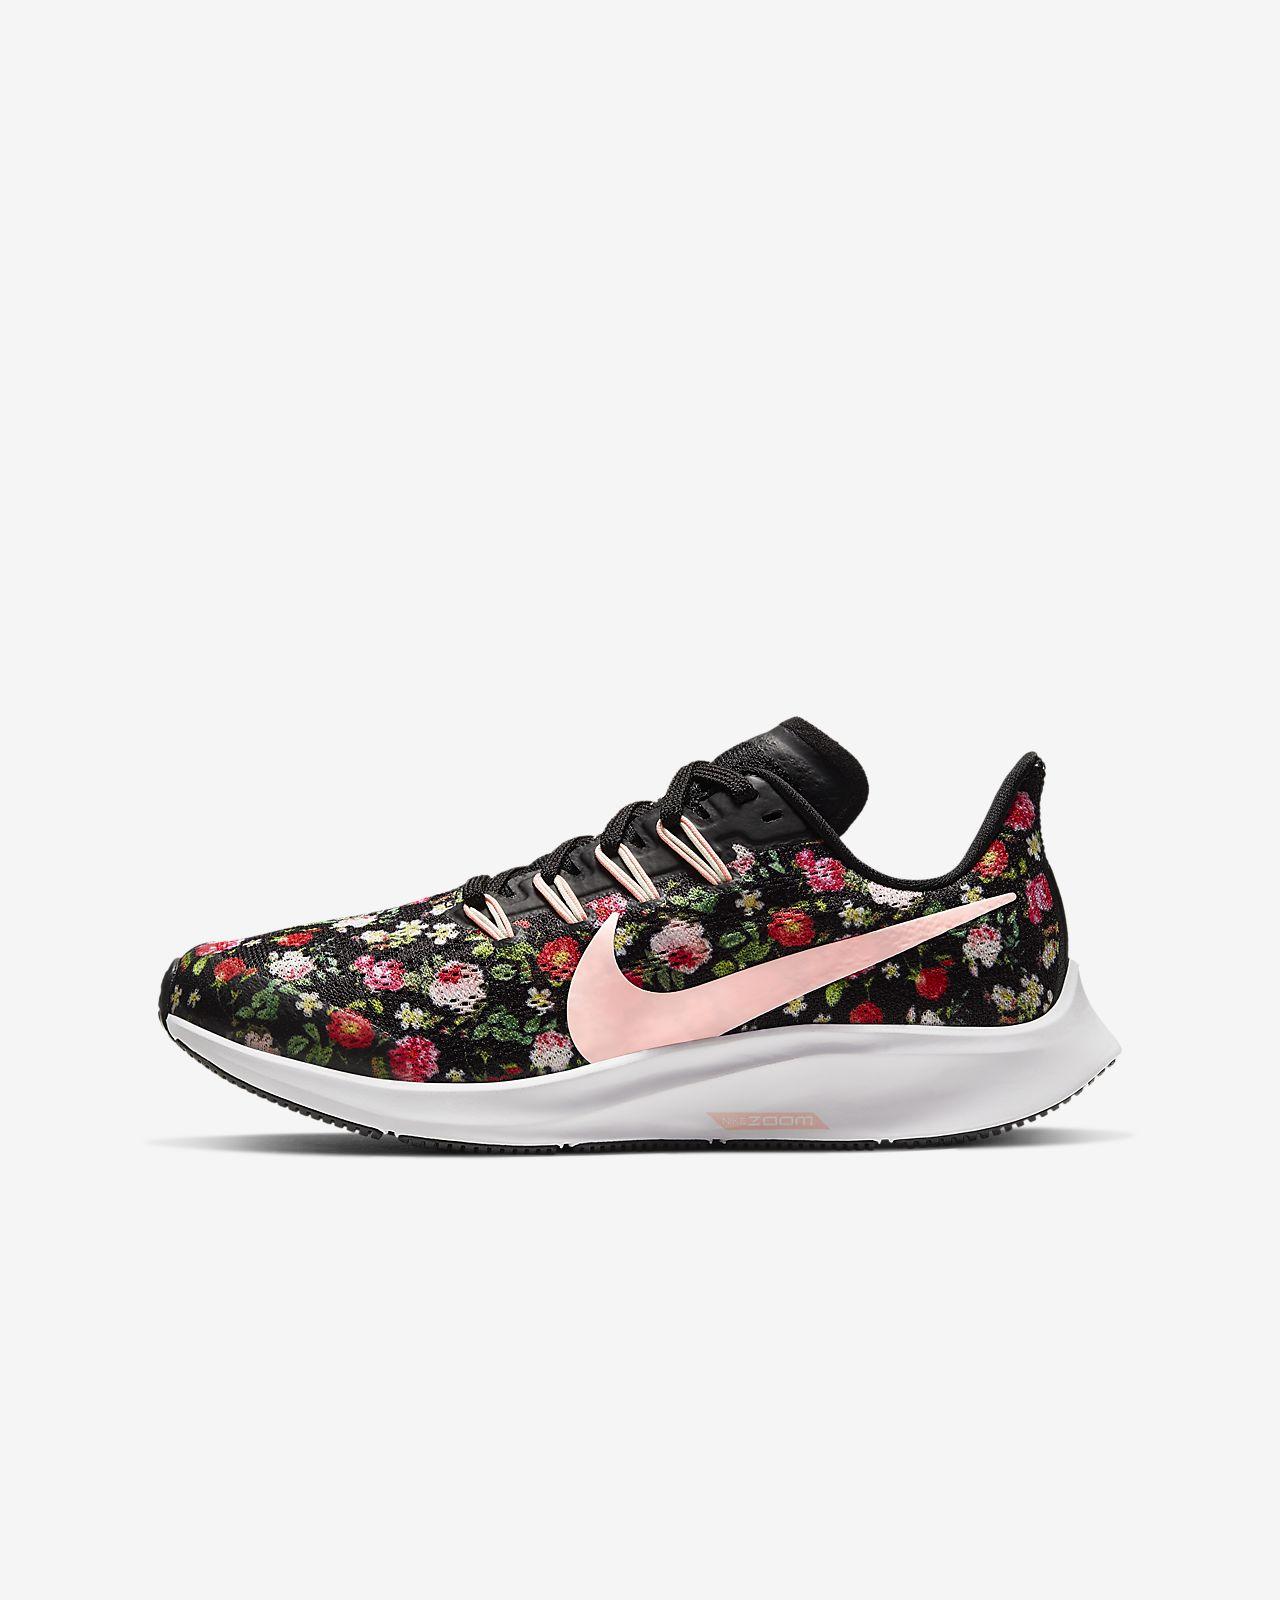 Nike Air Zoom Pegasus Vintage Floral Küçük/Genç Çocuk Ayakkabısı